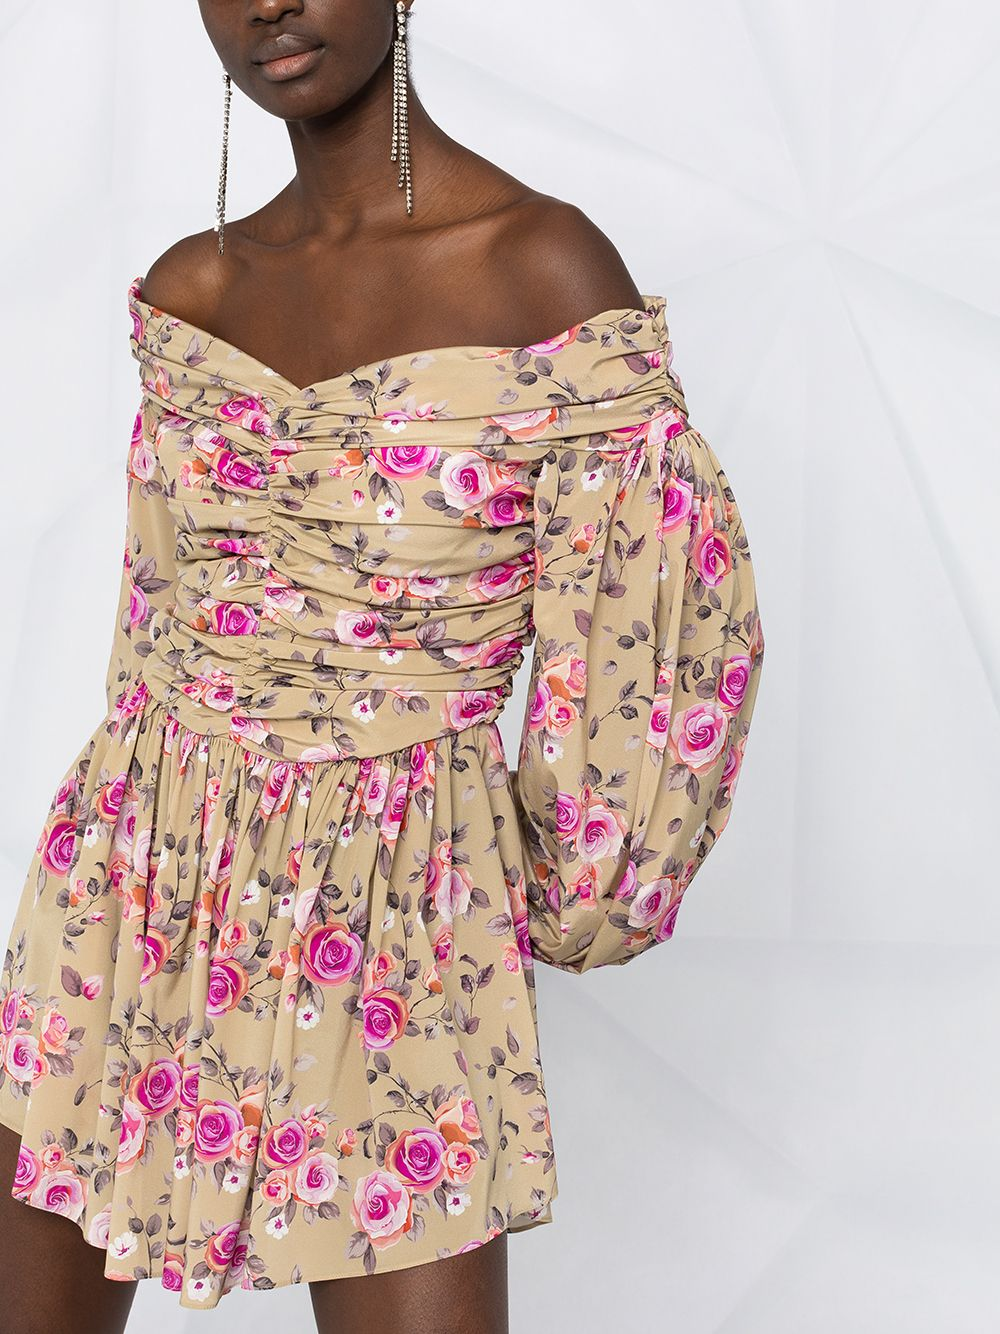 GIUSEPPE DI MORABITO | Dress | 179DR-127ST12-05